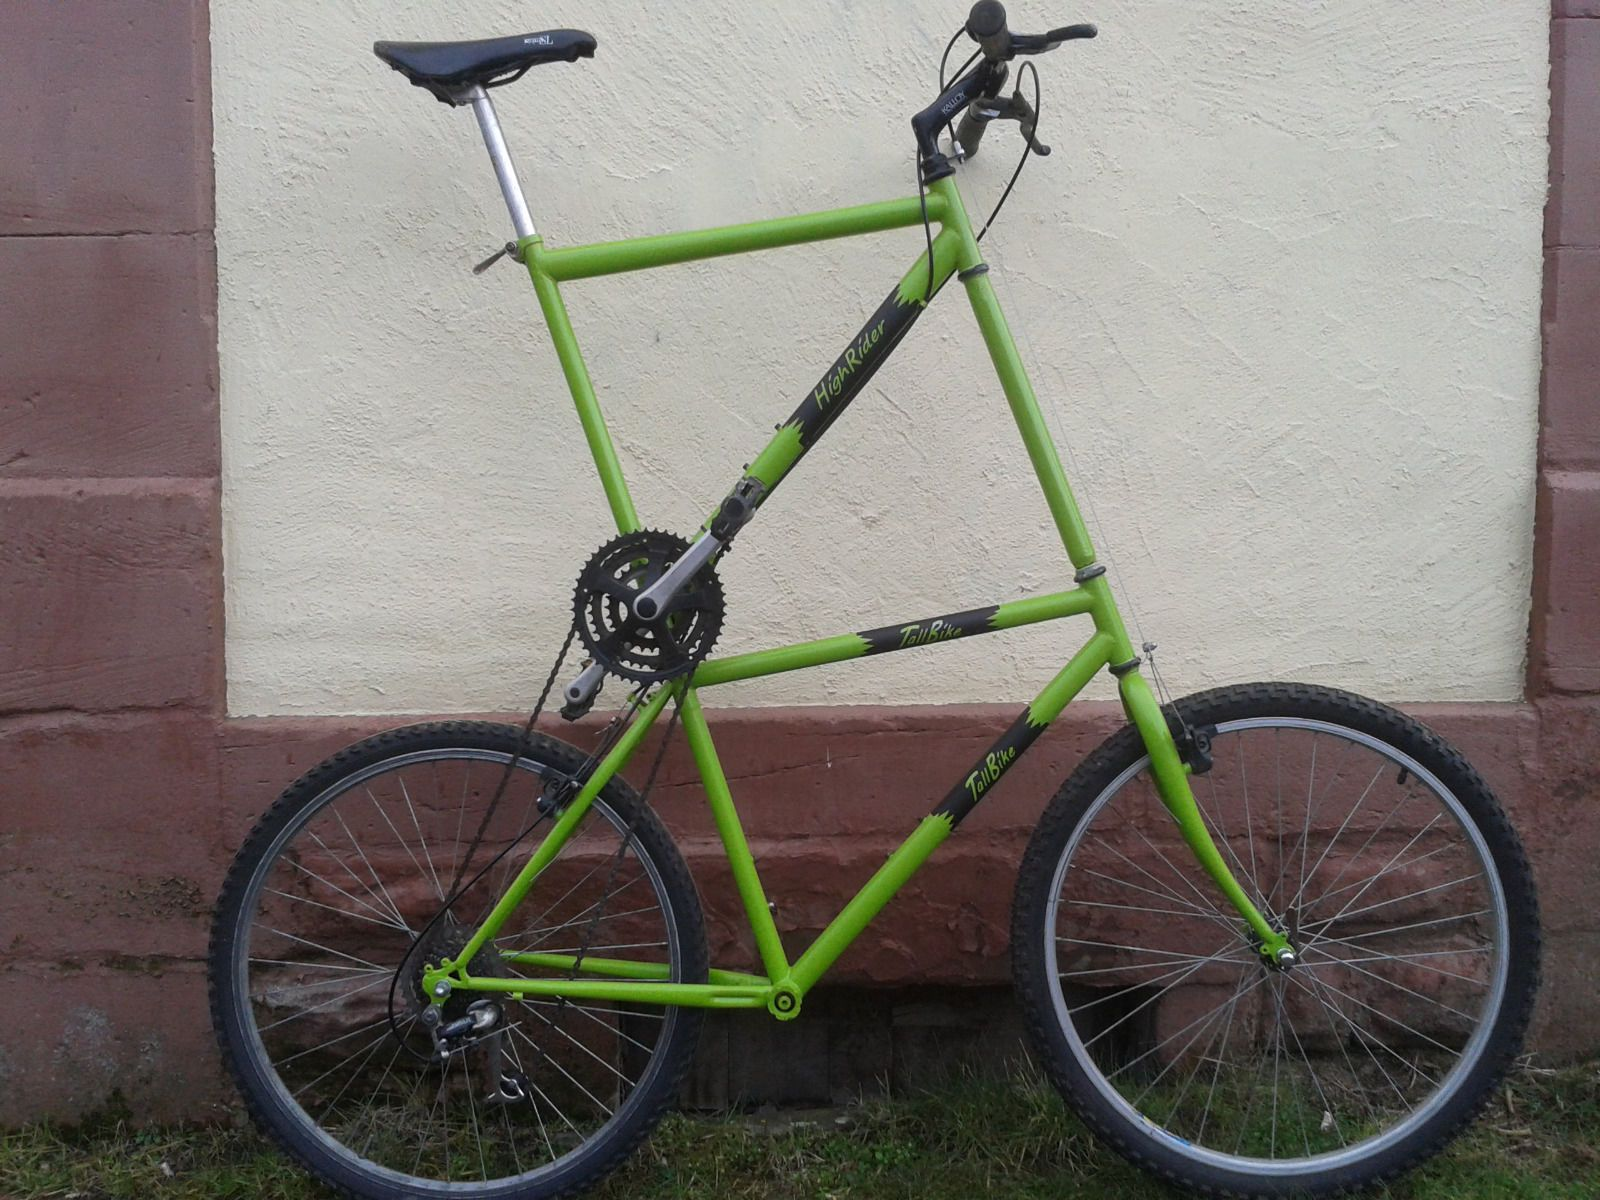 Farthing, tall bike, homemade racing, ladies bike, mountain bike, gents High Rider | eBay